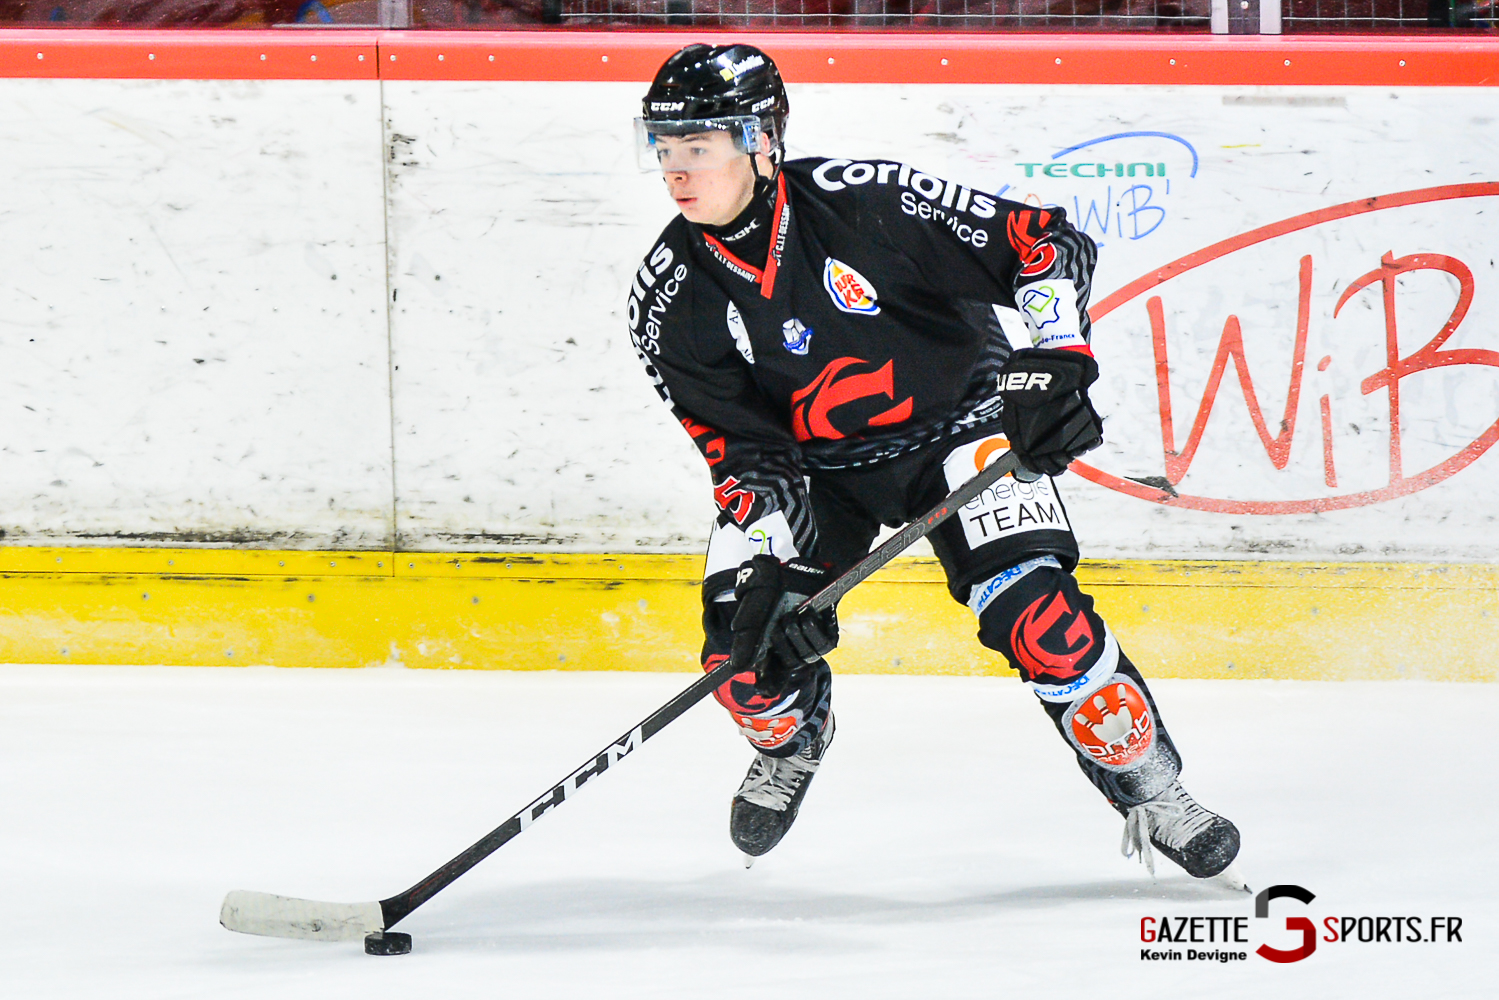 Hockey Sur Glace Amiens Vs Chamonix J18 Kevin Devigne Gazettesports 148